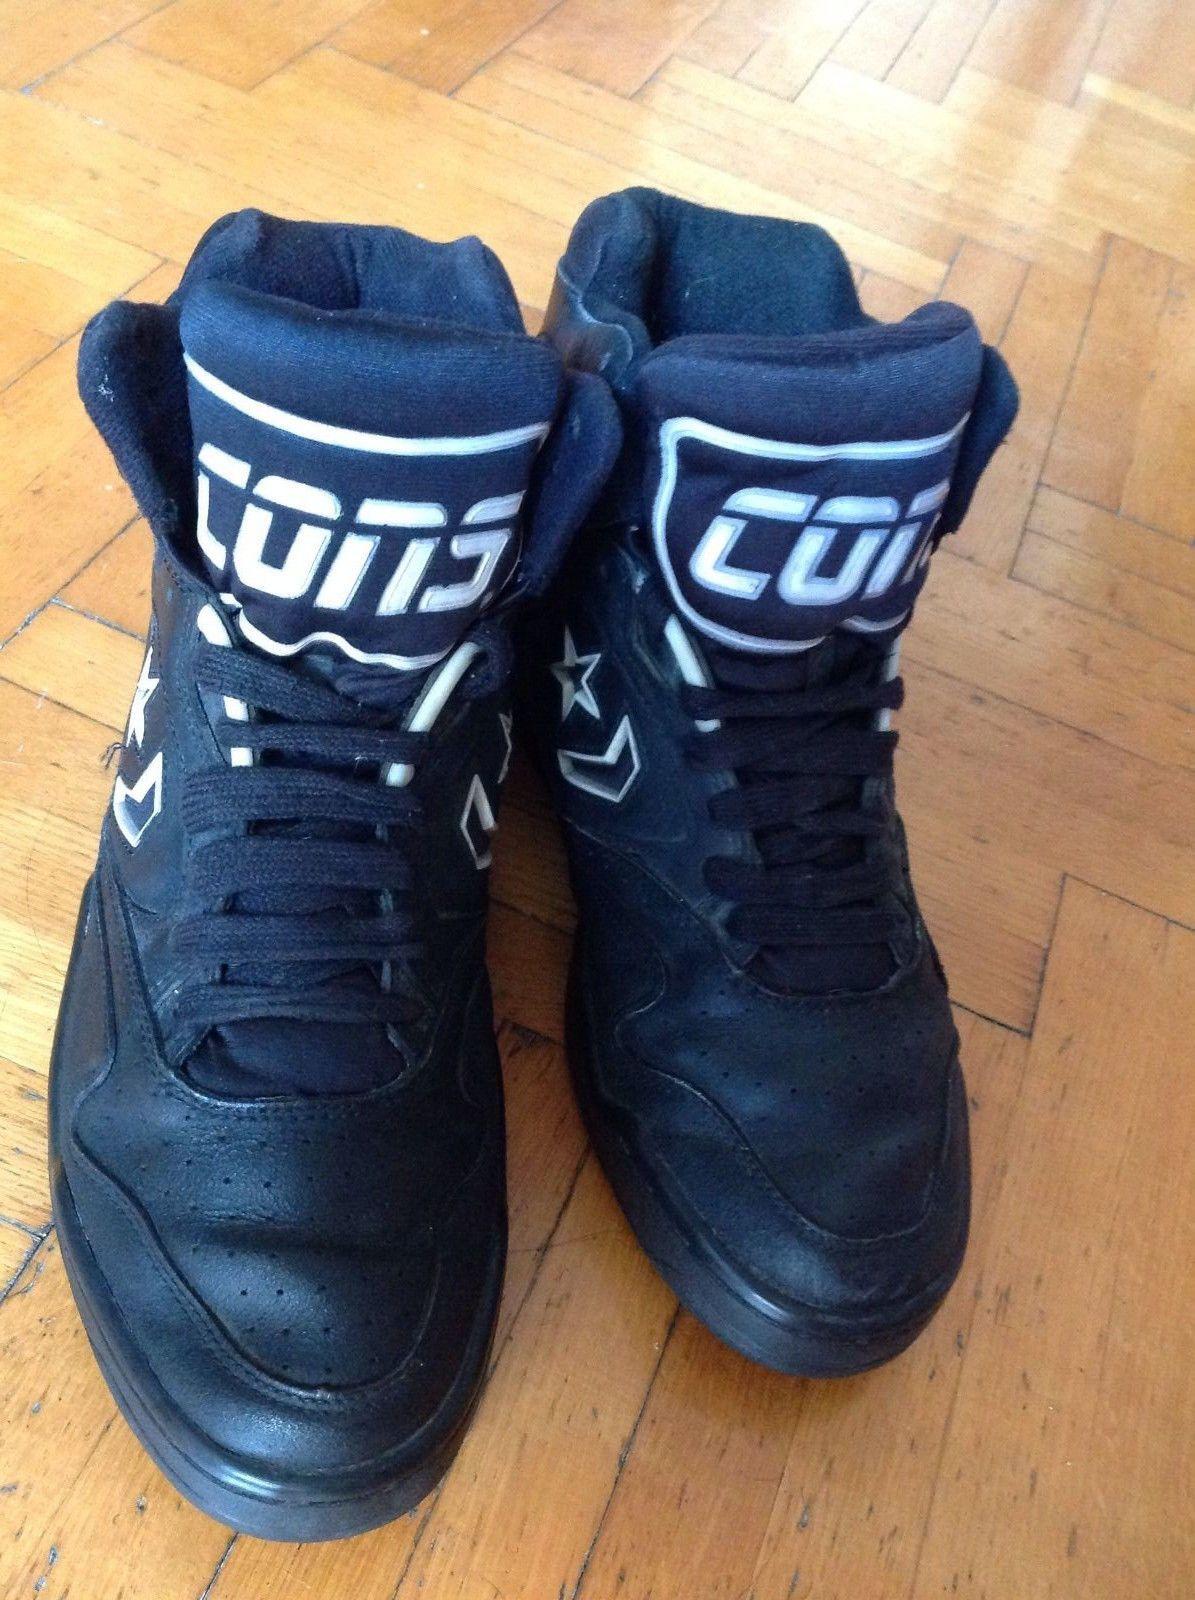 675984f1050 Converse Cons ERX Hi Top Size 9 1 2 US Black 90 s Vintage Basketball NBA